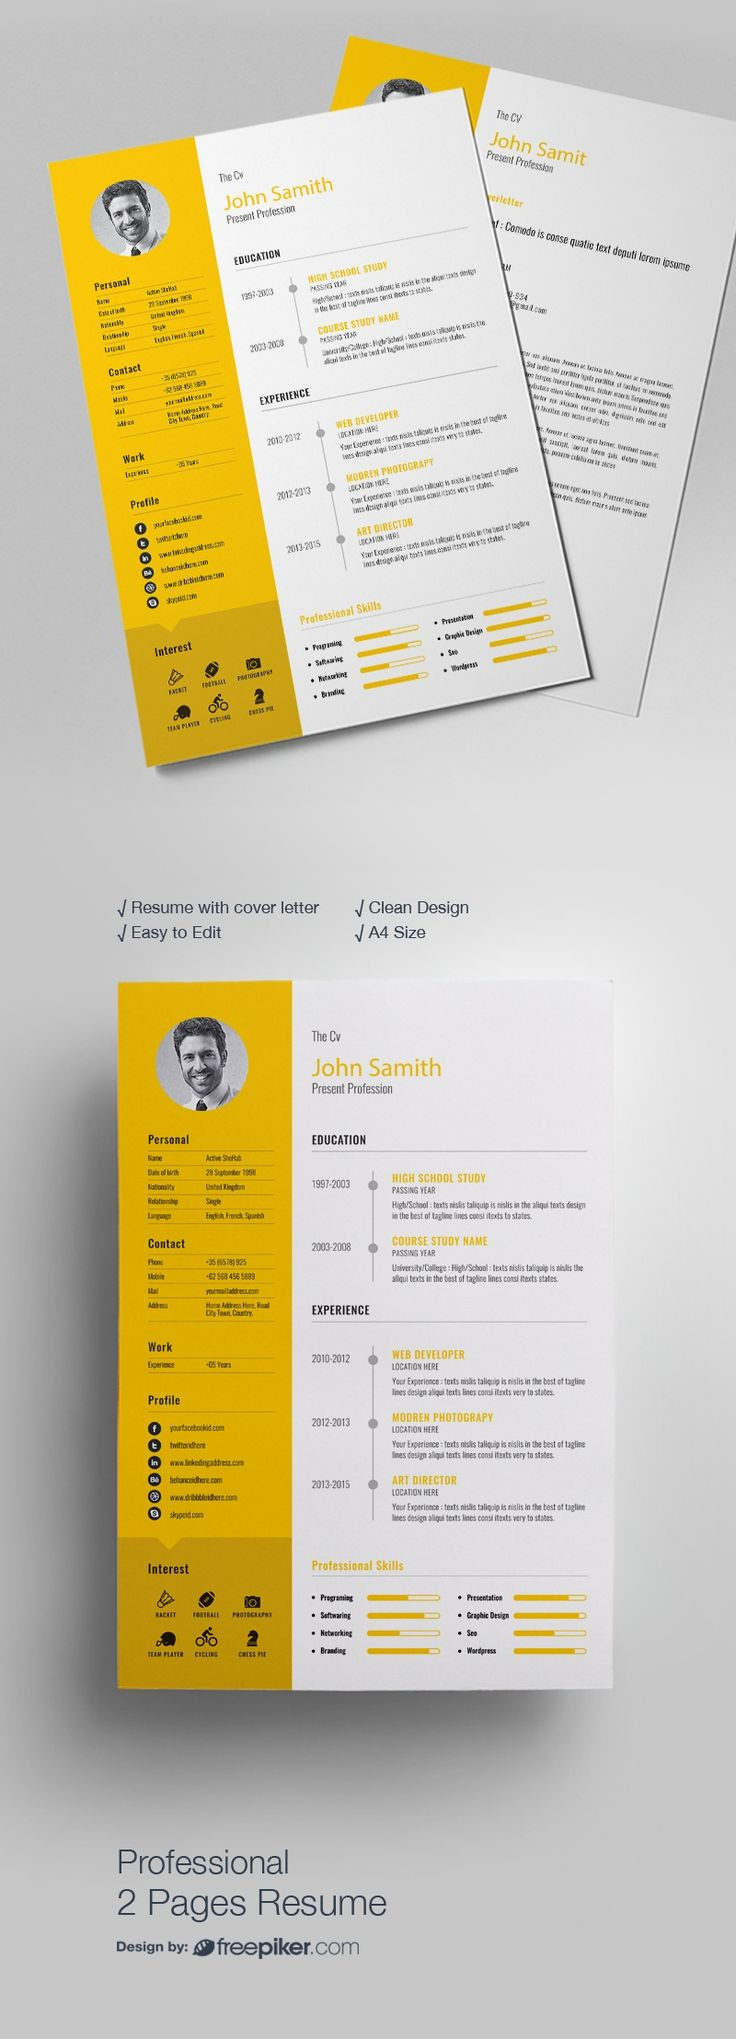 52 Best Resumes Images On Pinterest Logo Psd Design Resume And